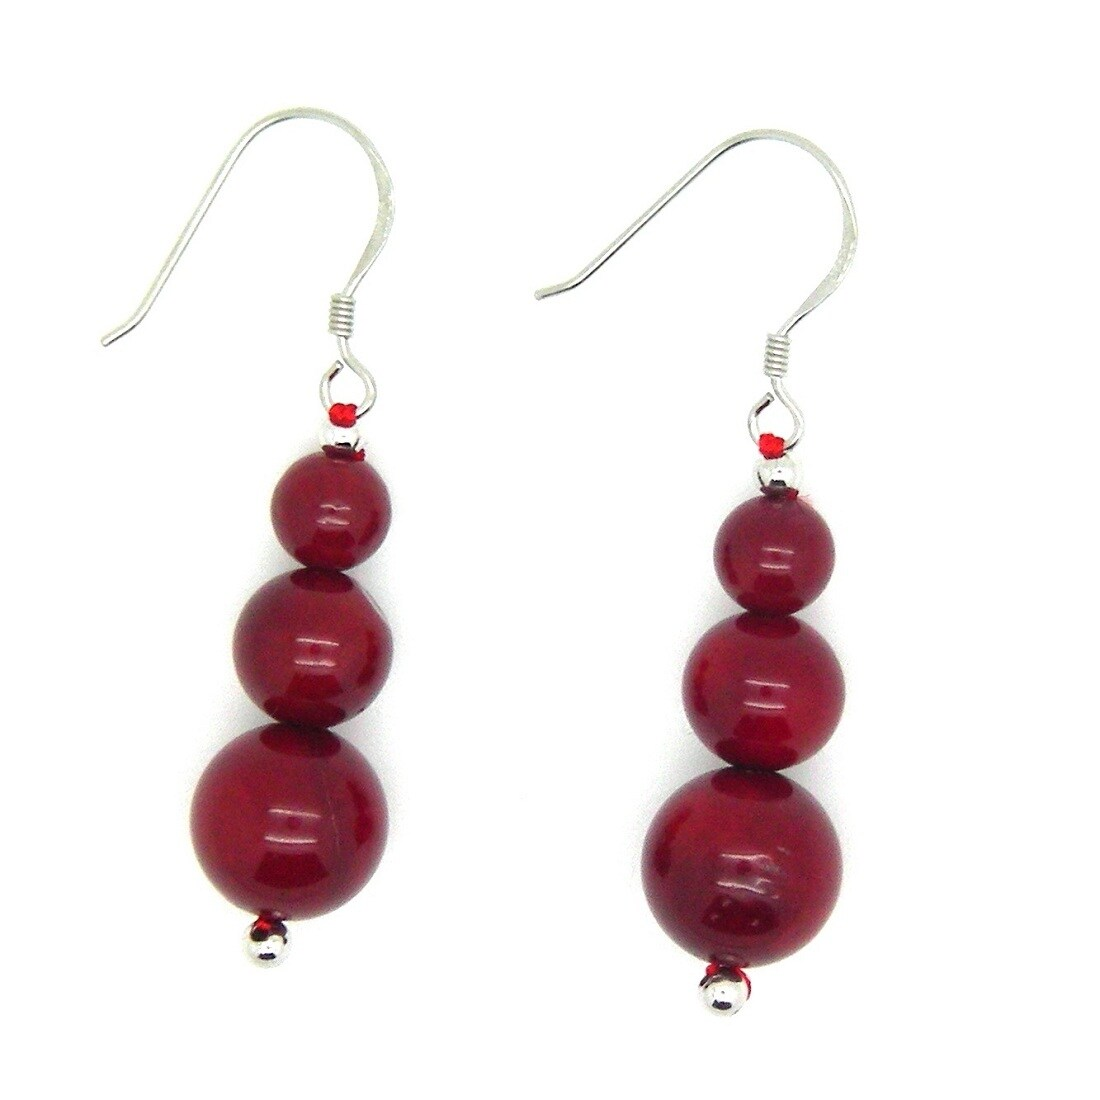 Pearlz Ocean Sterling Silver Red Coral Journey Earrings